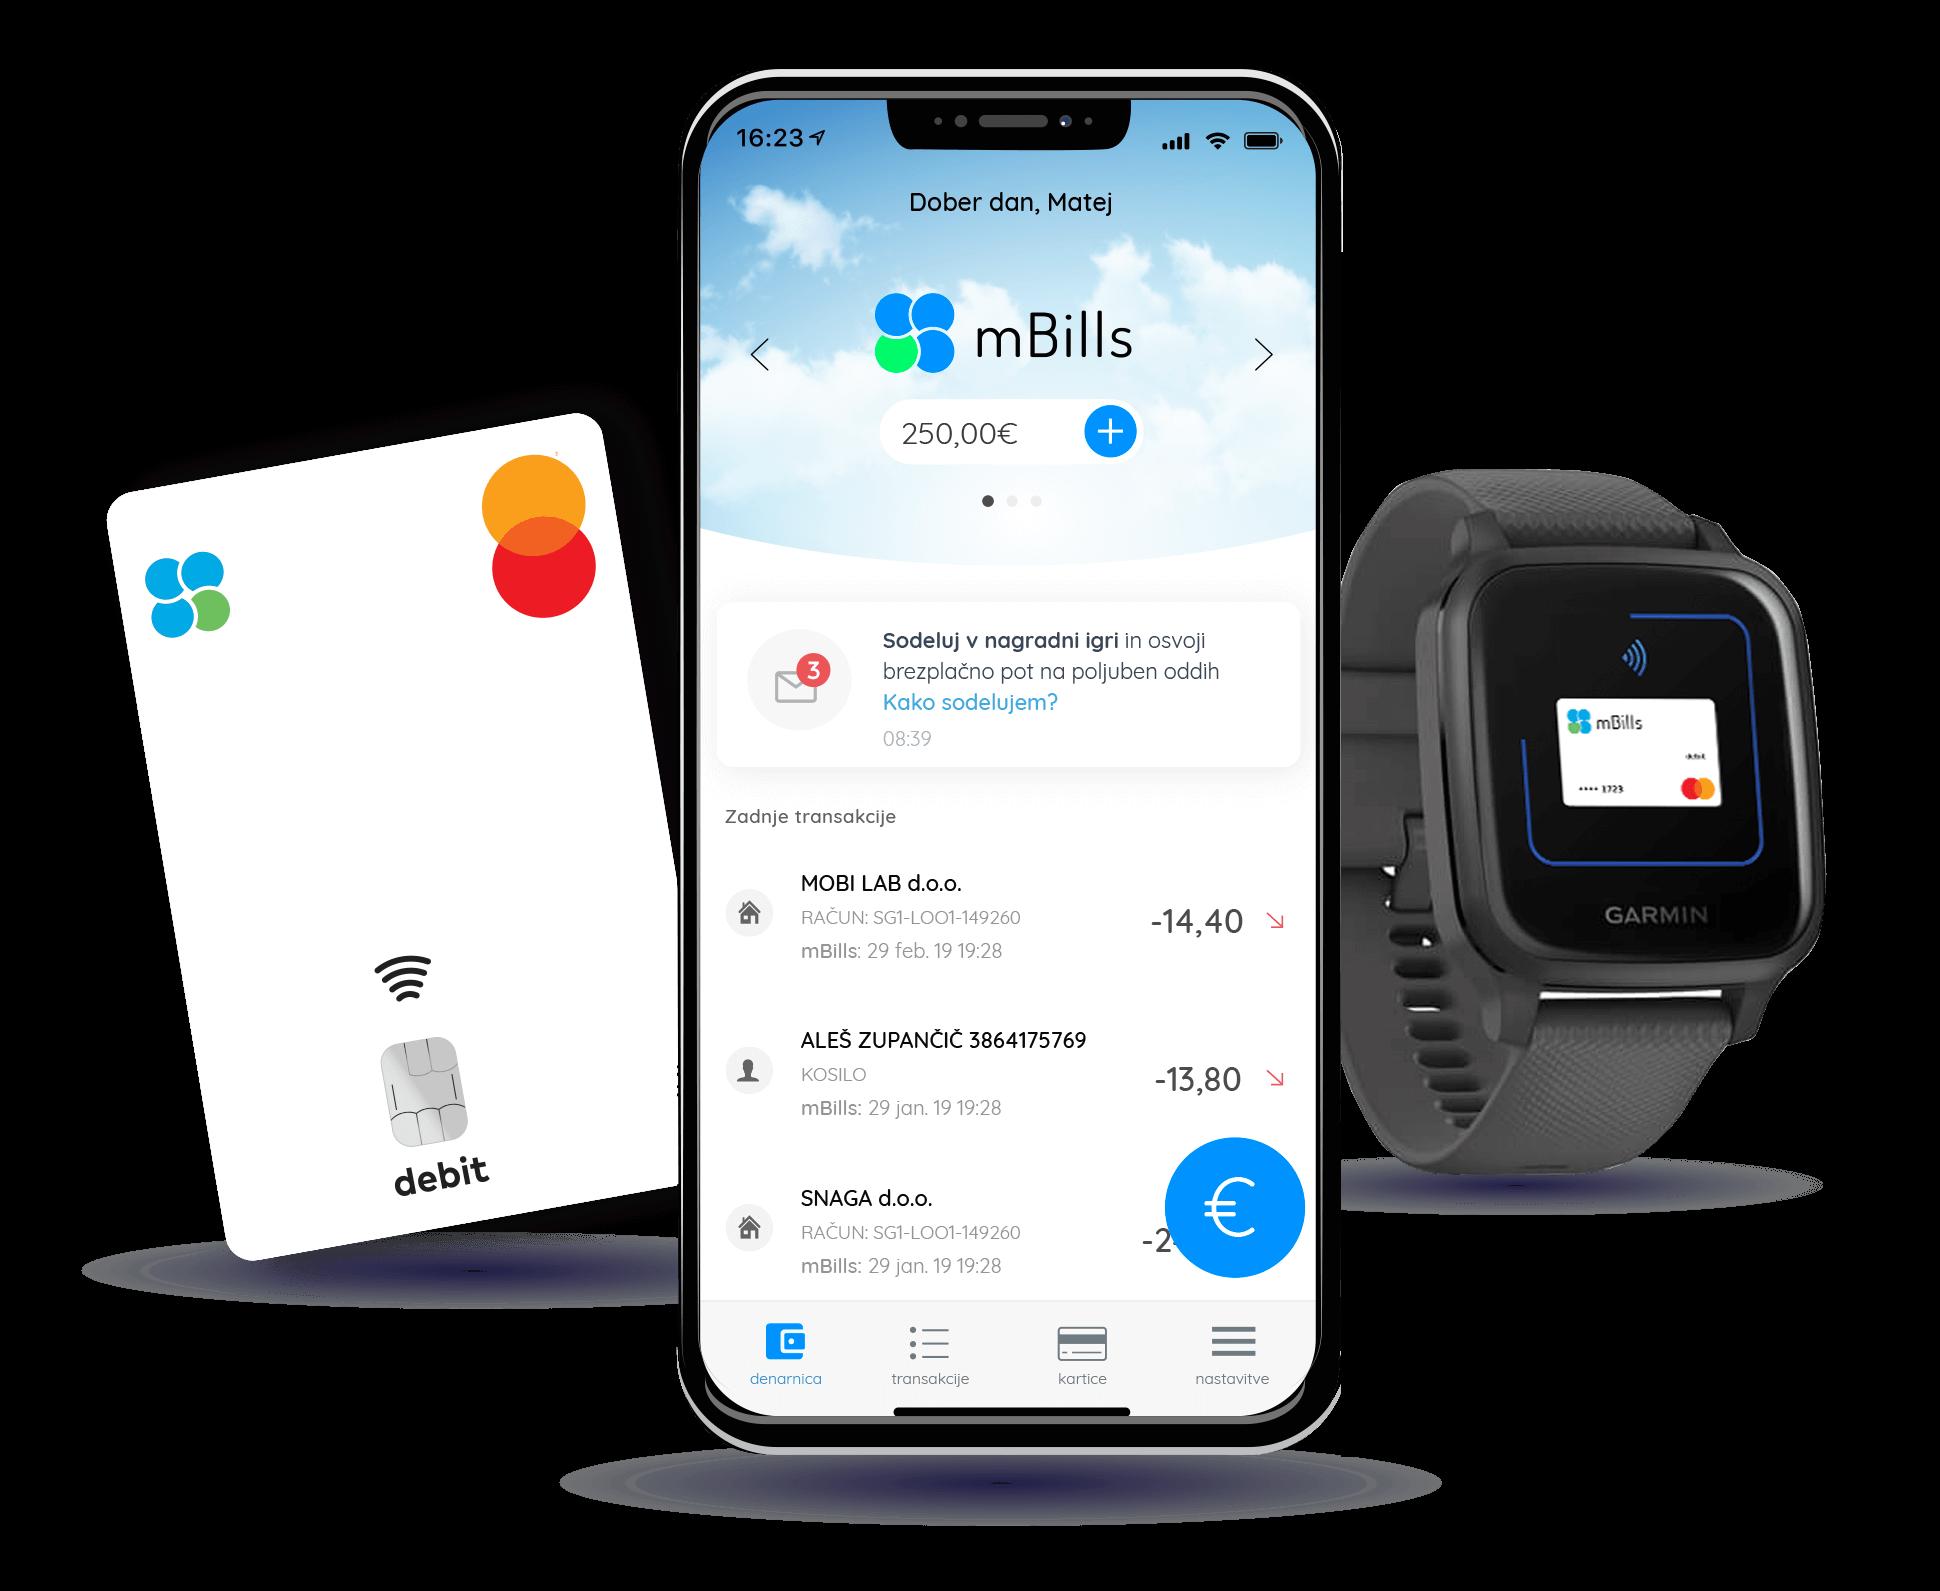 Aplikacija mBills, kartica mBills in pametna ura z aktiviranim načinom za plačevanje